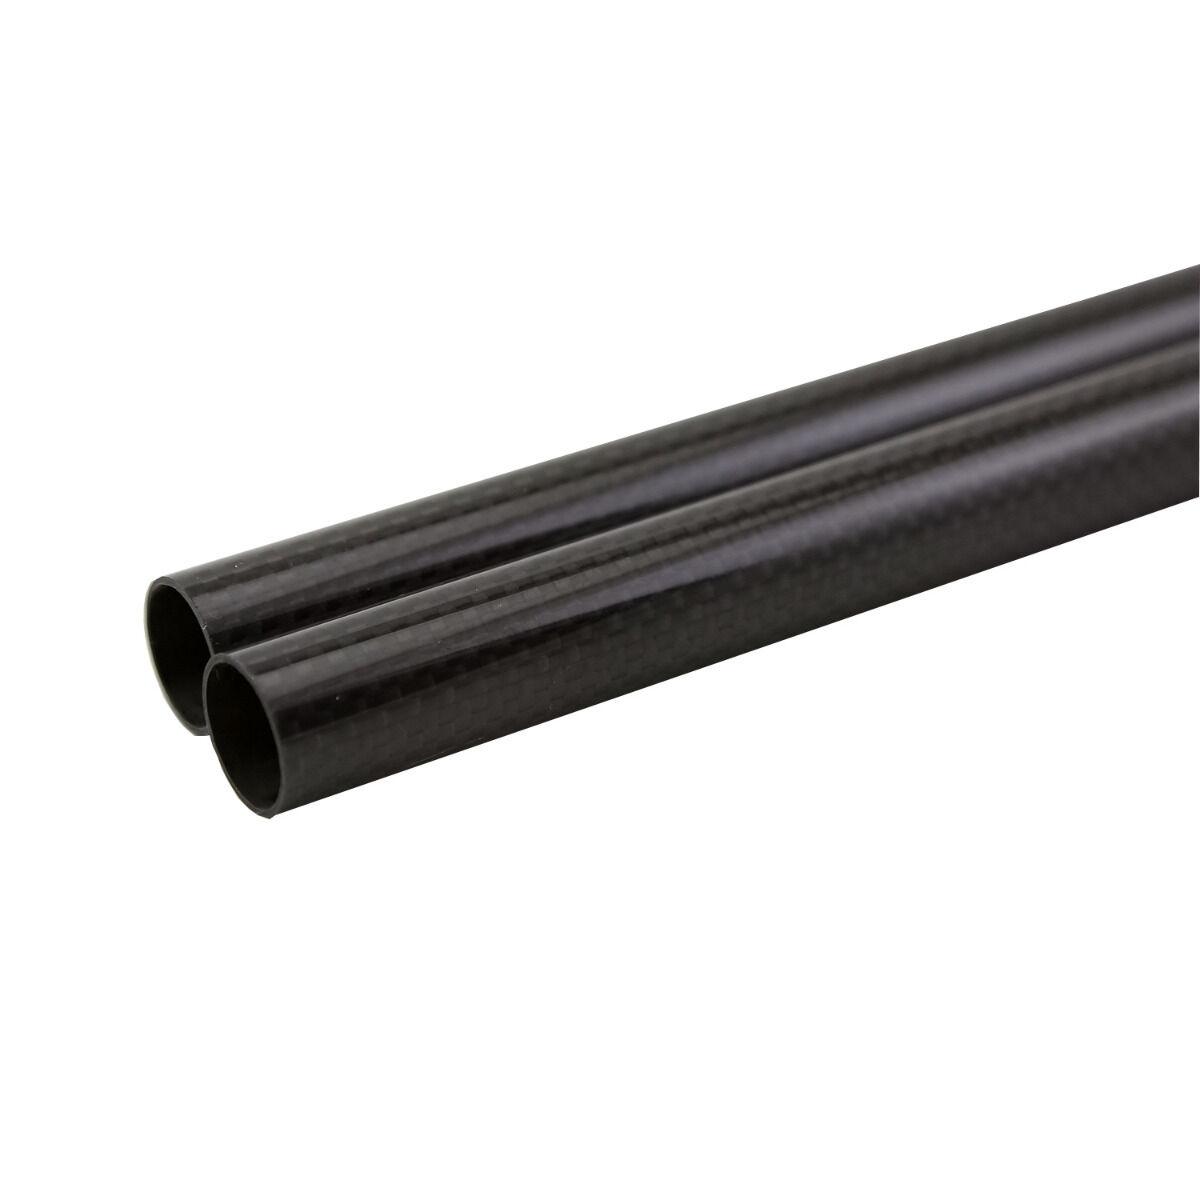 2Pcs 500mm 3K Fibra De Carbono 100% Rollo envuelto Tubo 36mm40mm500mm de superficie brillante